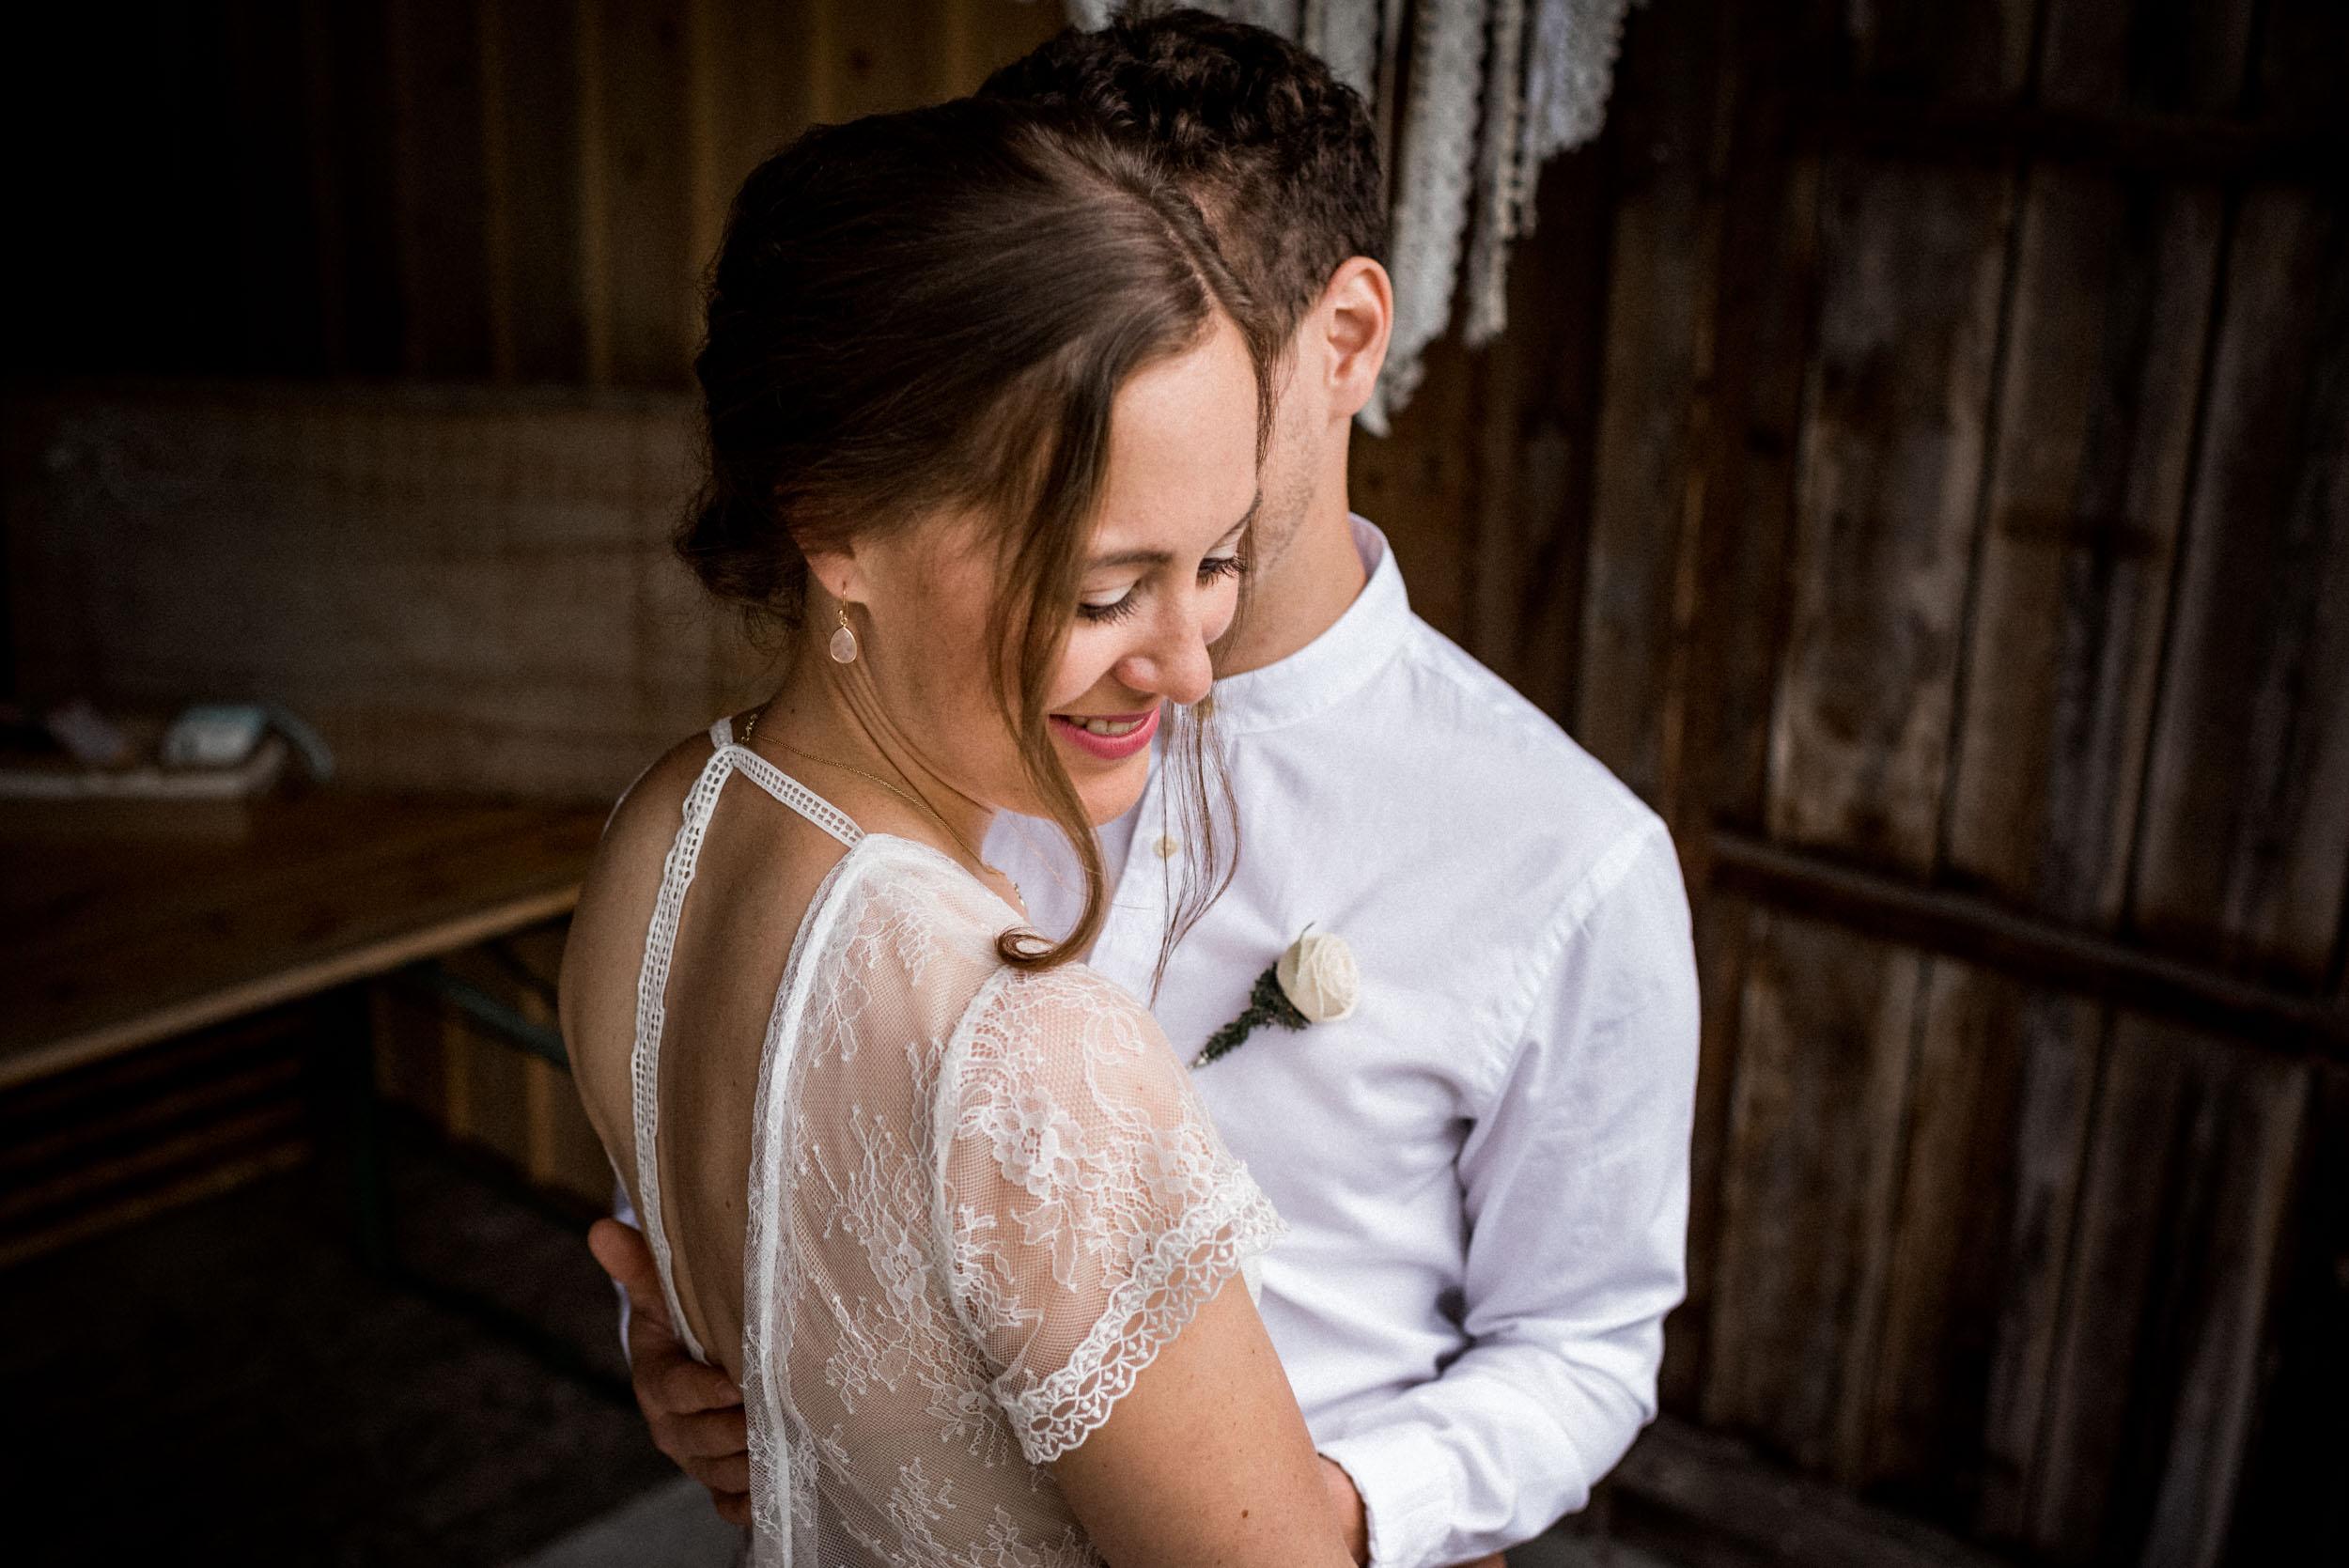 Hochzeitsreportage-Baden-Aargau_2019_4.jpg